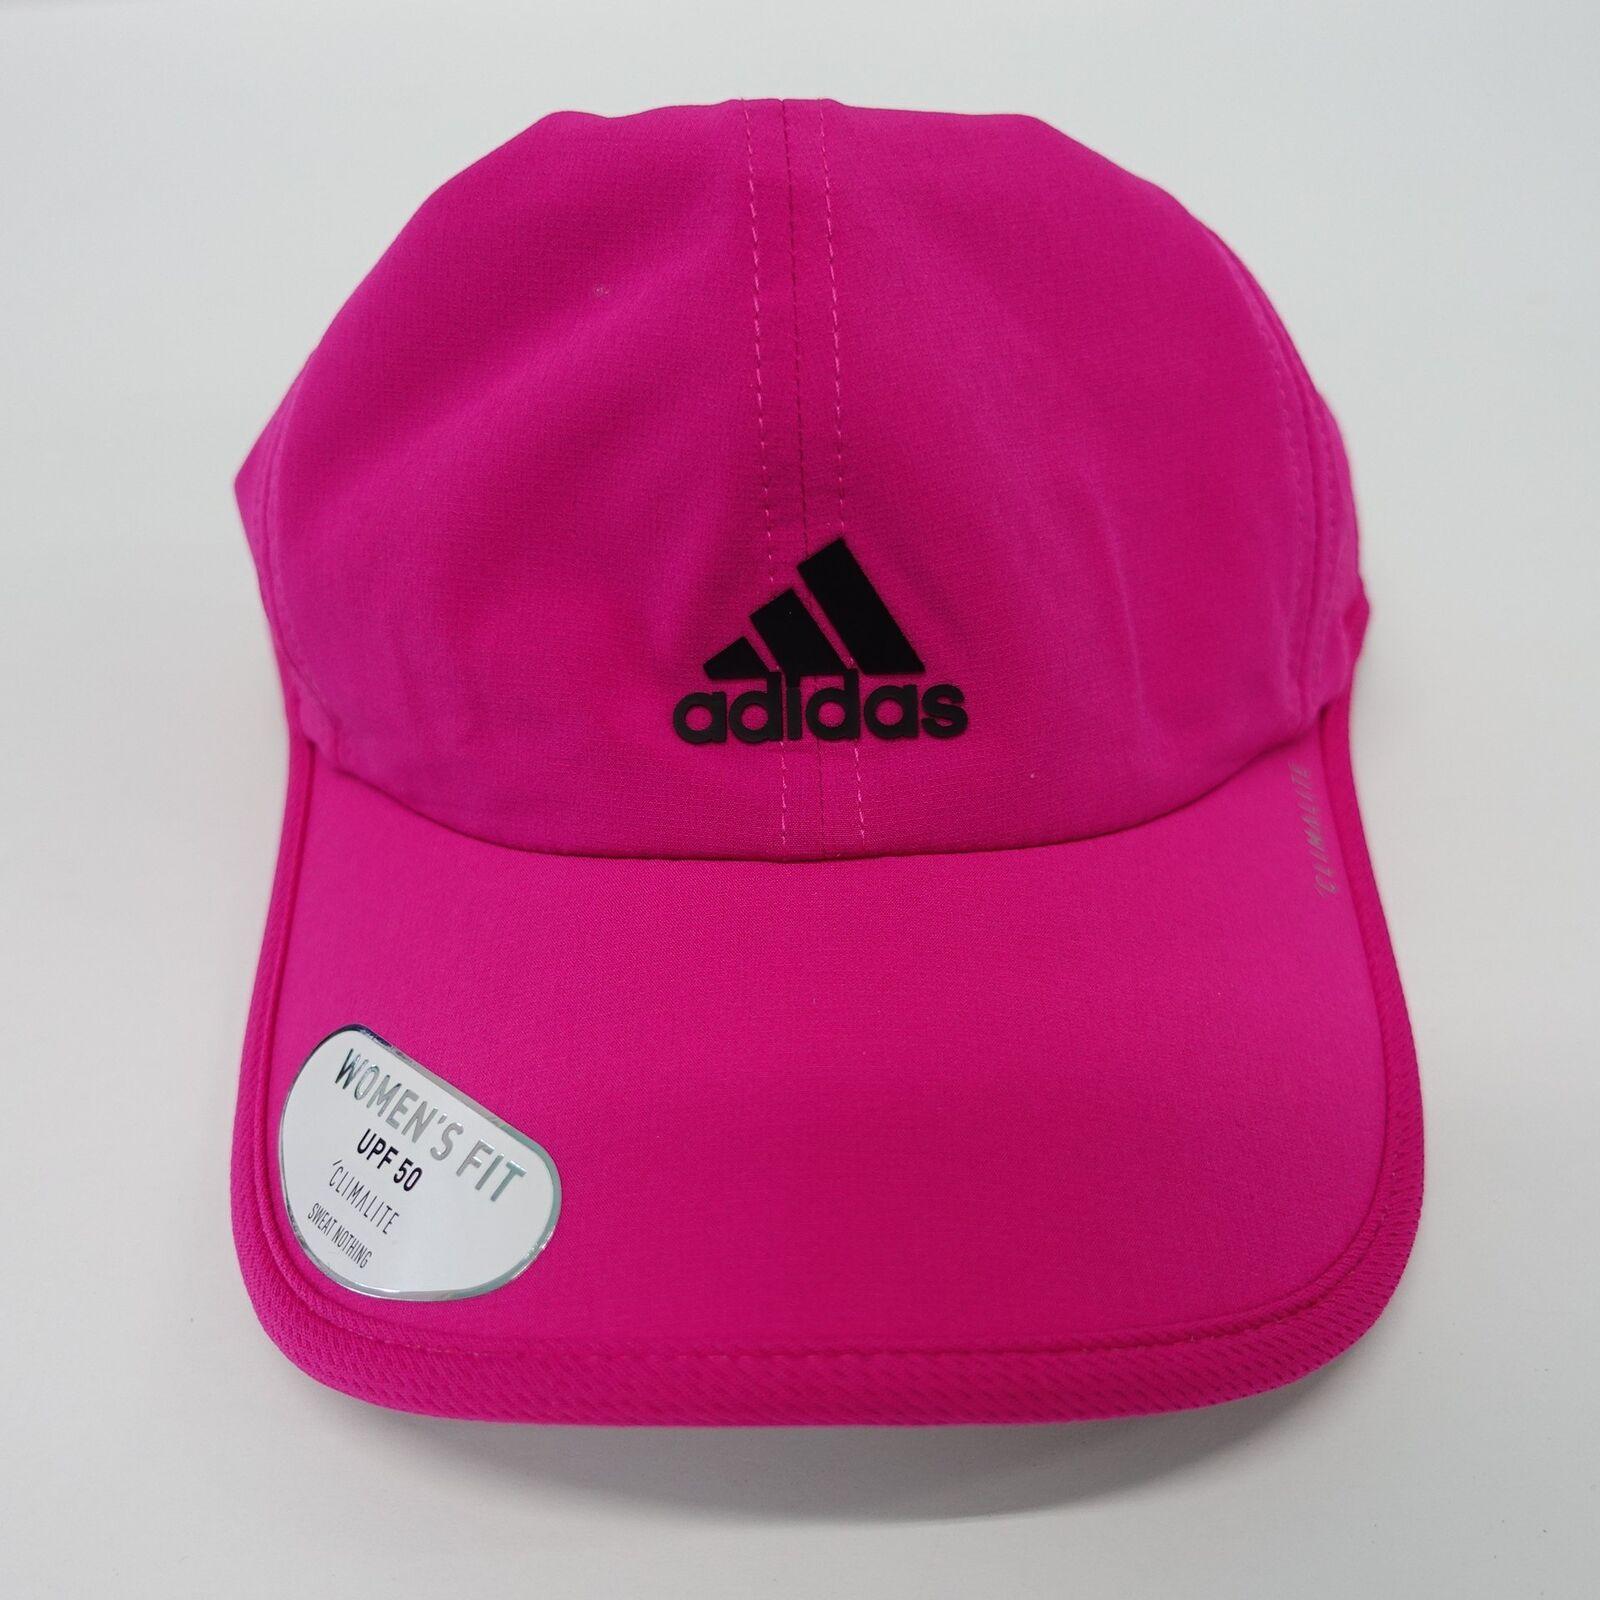 5d58f0a049b Womens adidas Superlite Cap Pink Climalite Real Magenta Lightweight ...